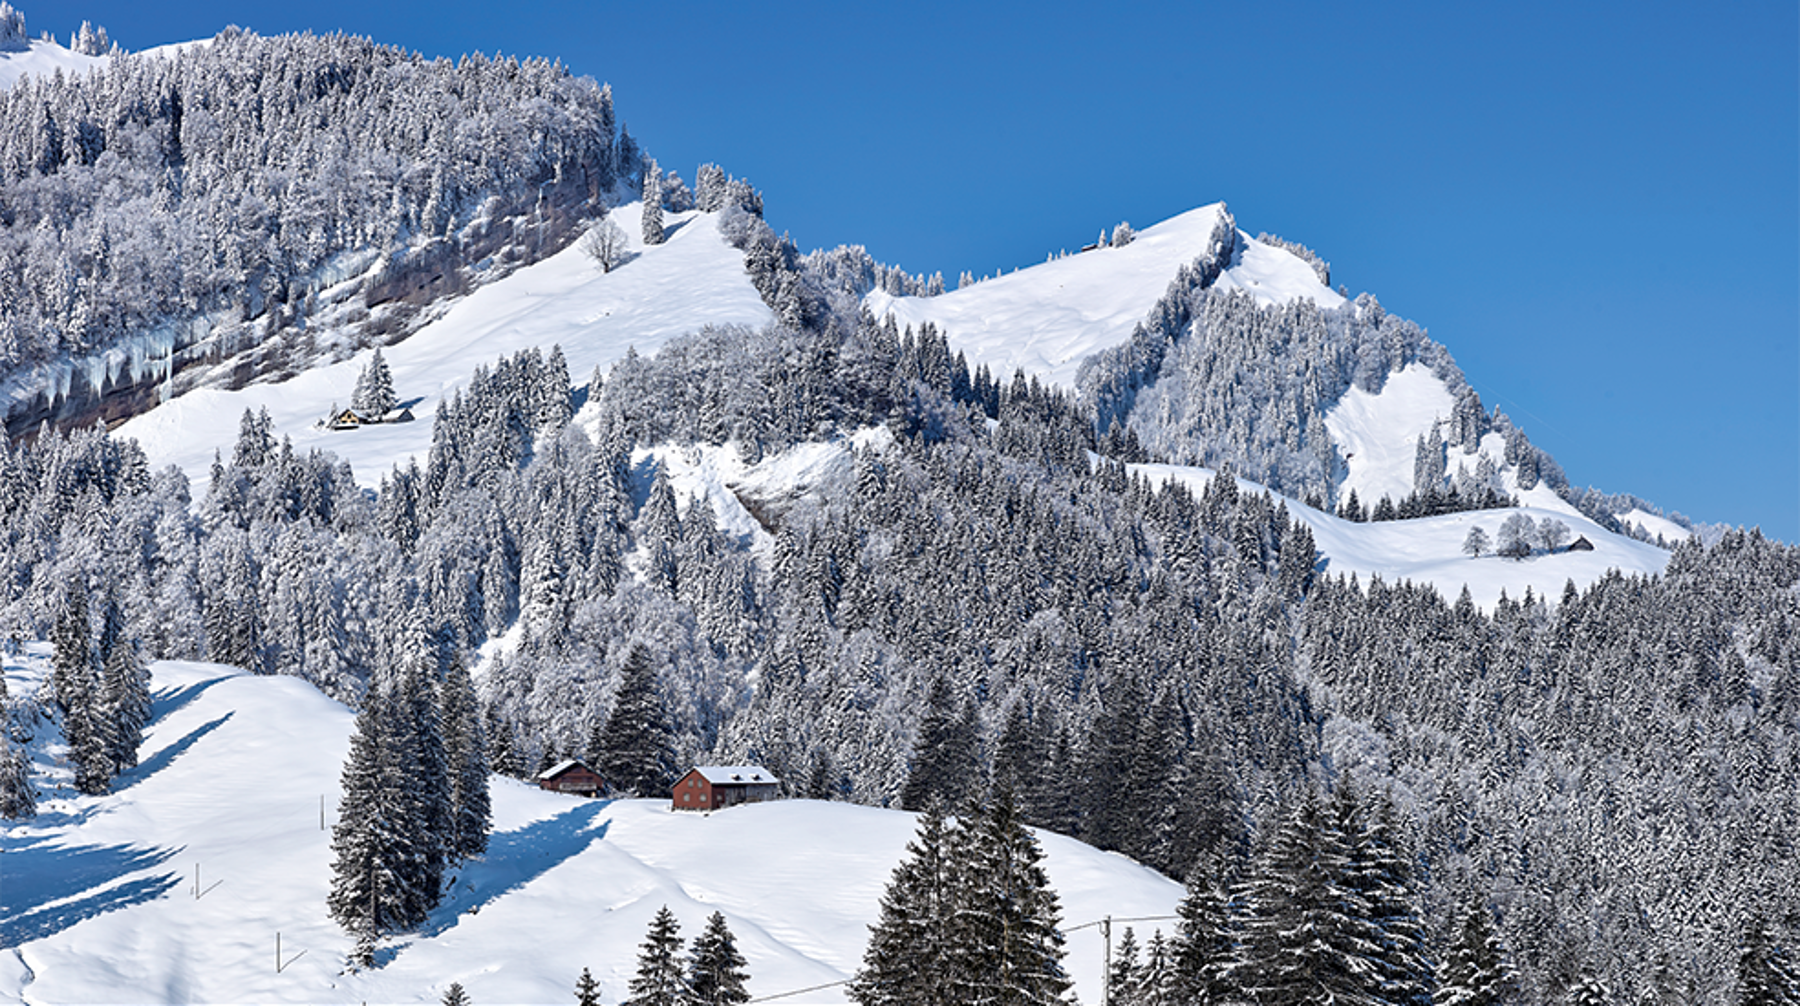 Panorama Appenzellerland 2019 Januar